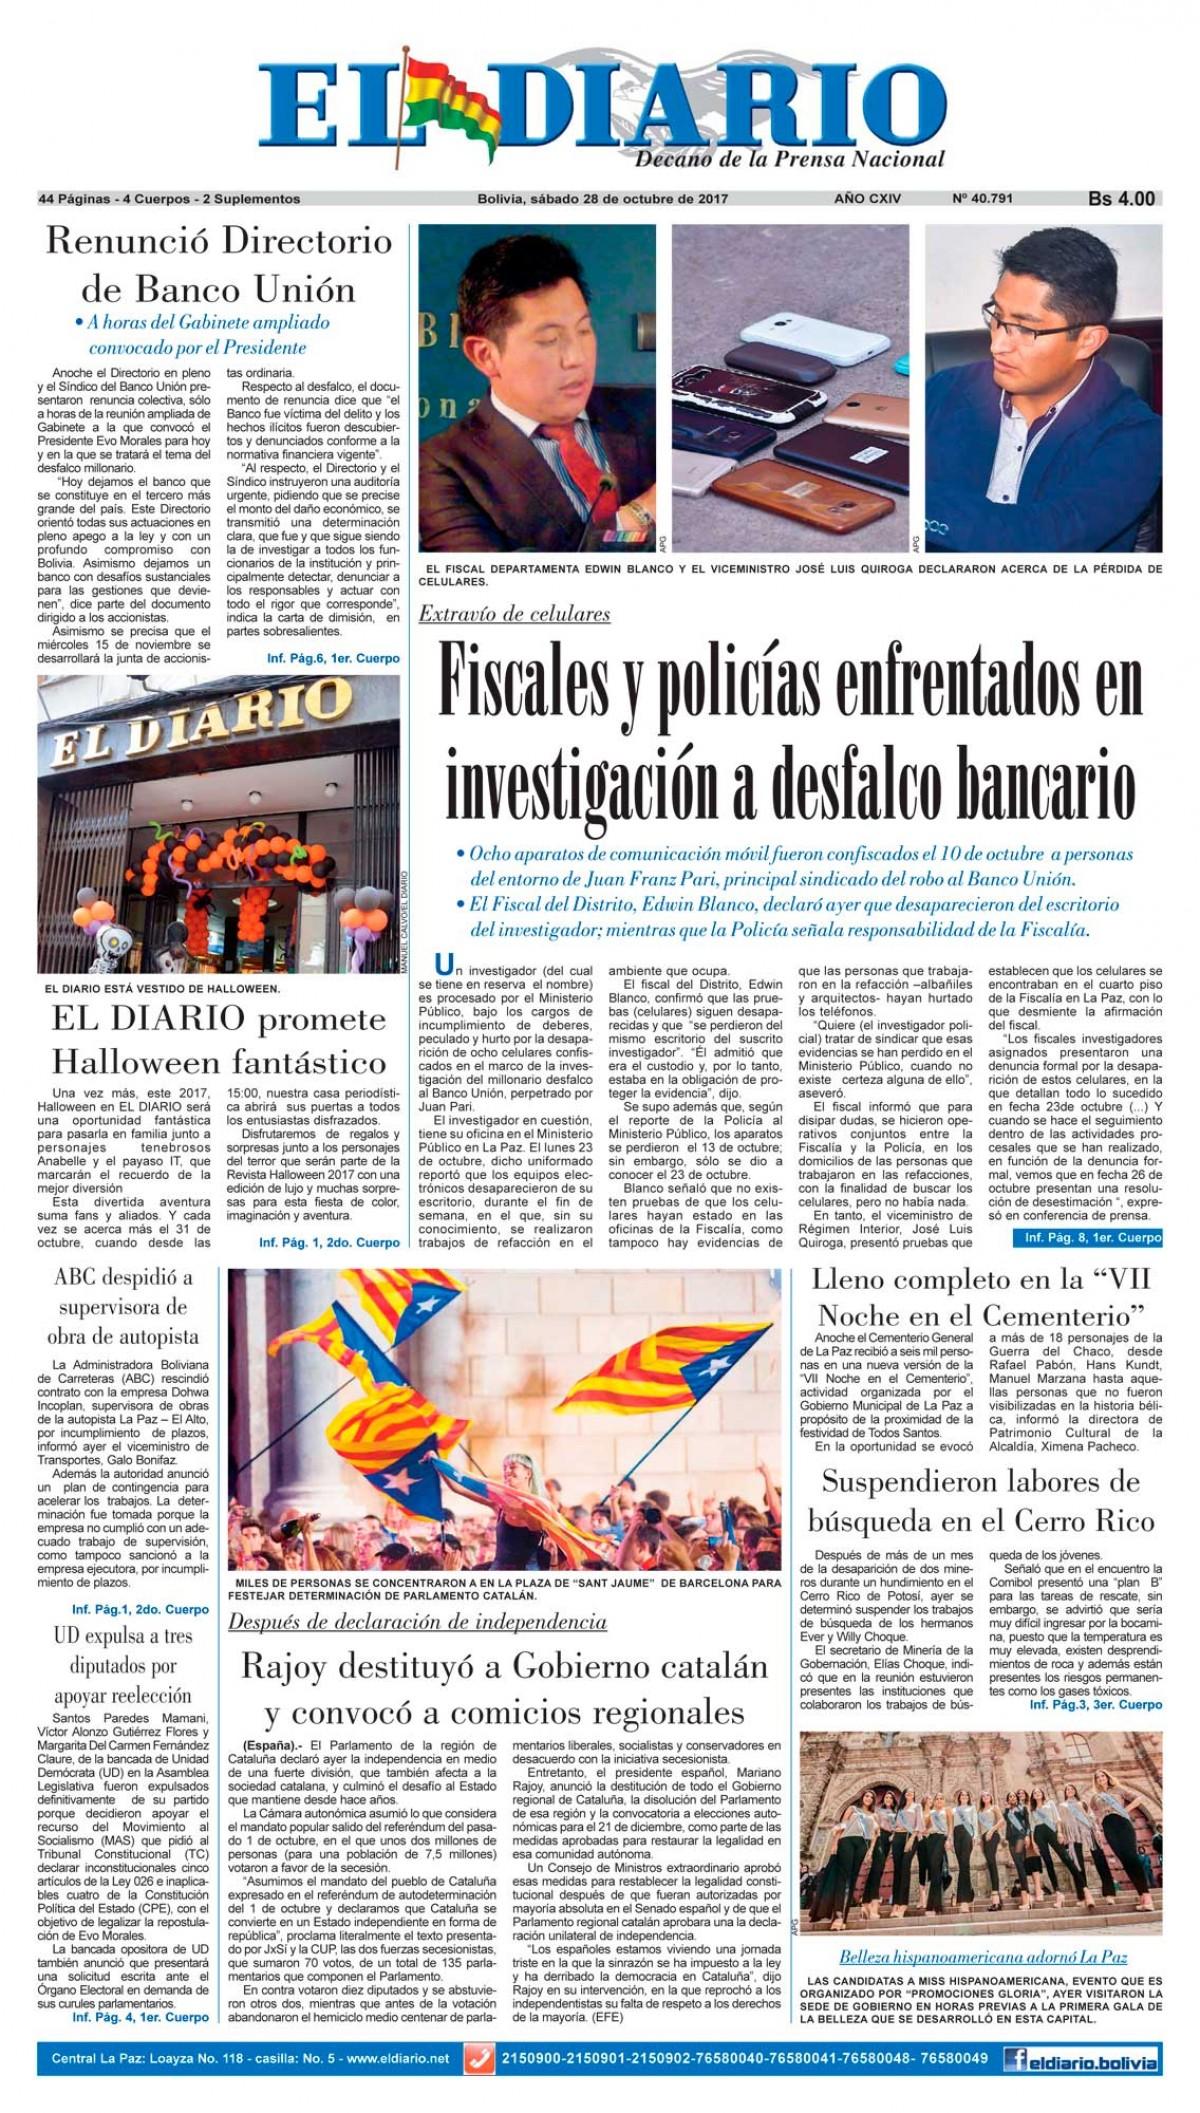 eldiario.net59f46dd2a85c2.jpg